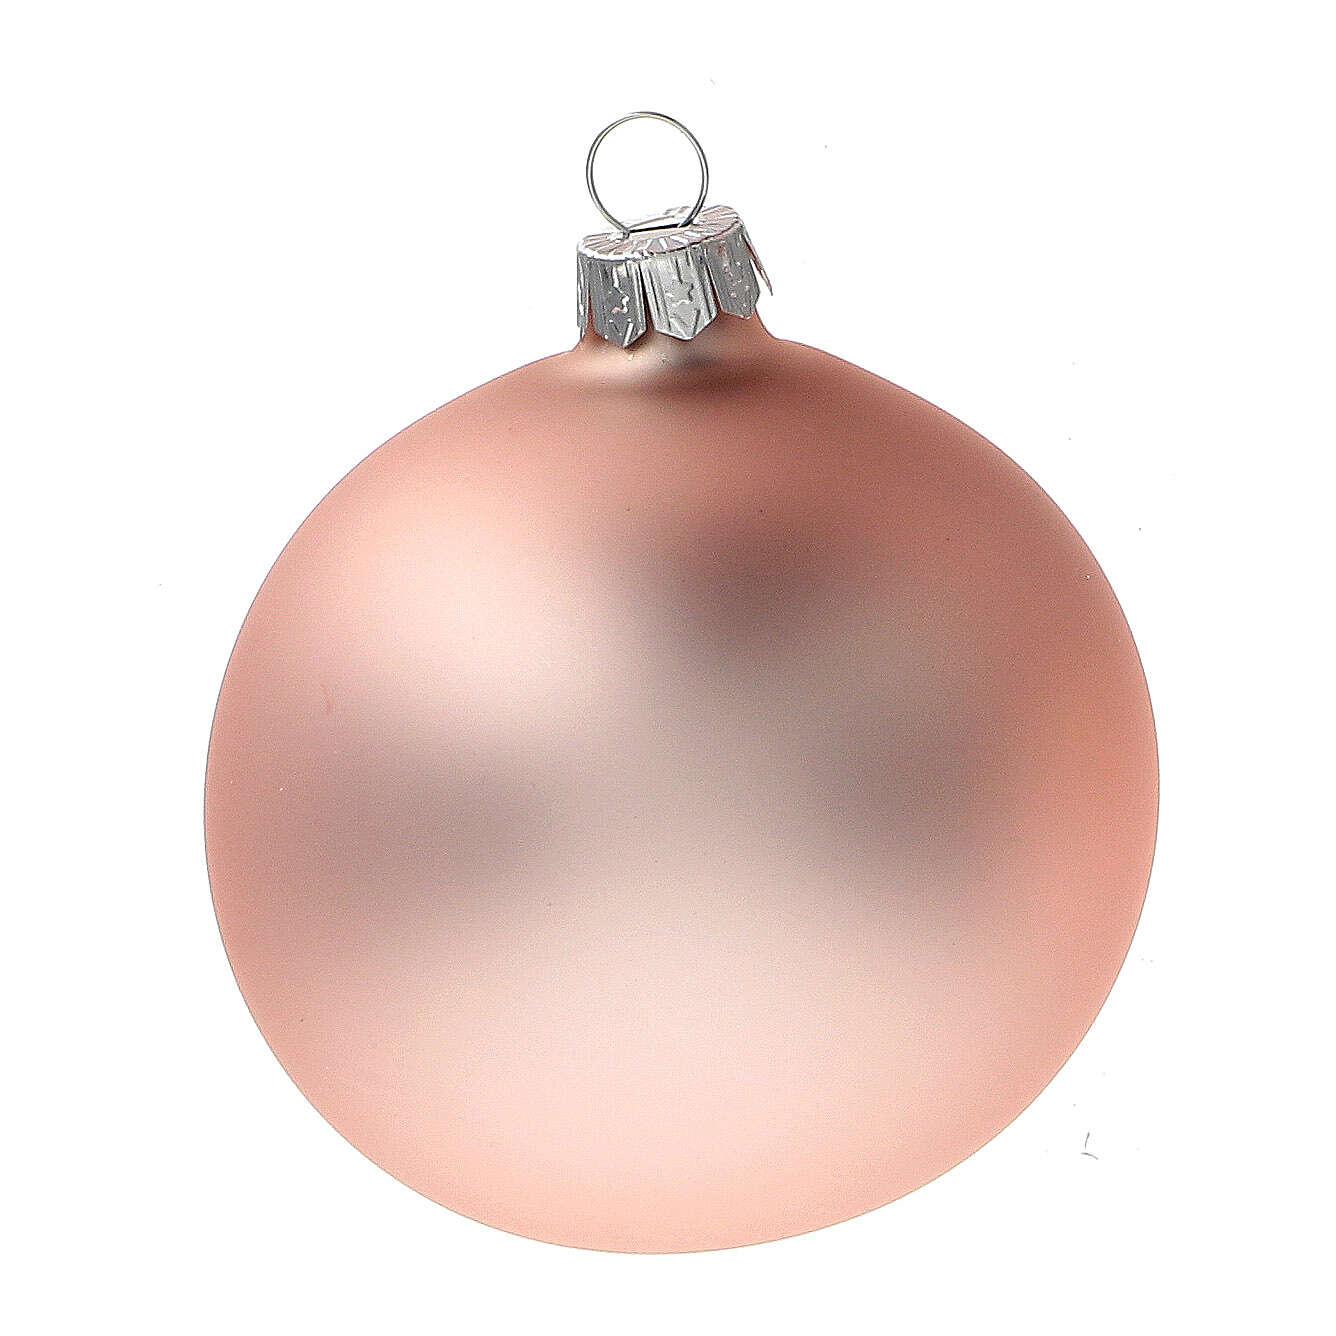 Bolas árvore de Natal vidro soprado cor-de-rosa claro opaco 80 mm 6 unidades 4